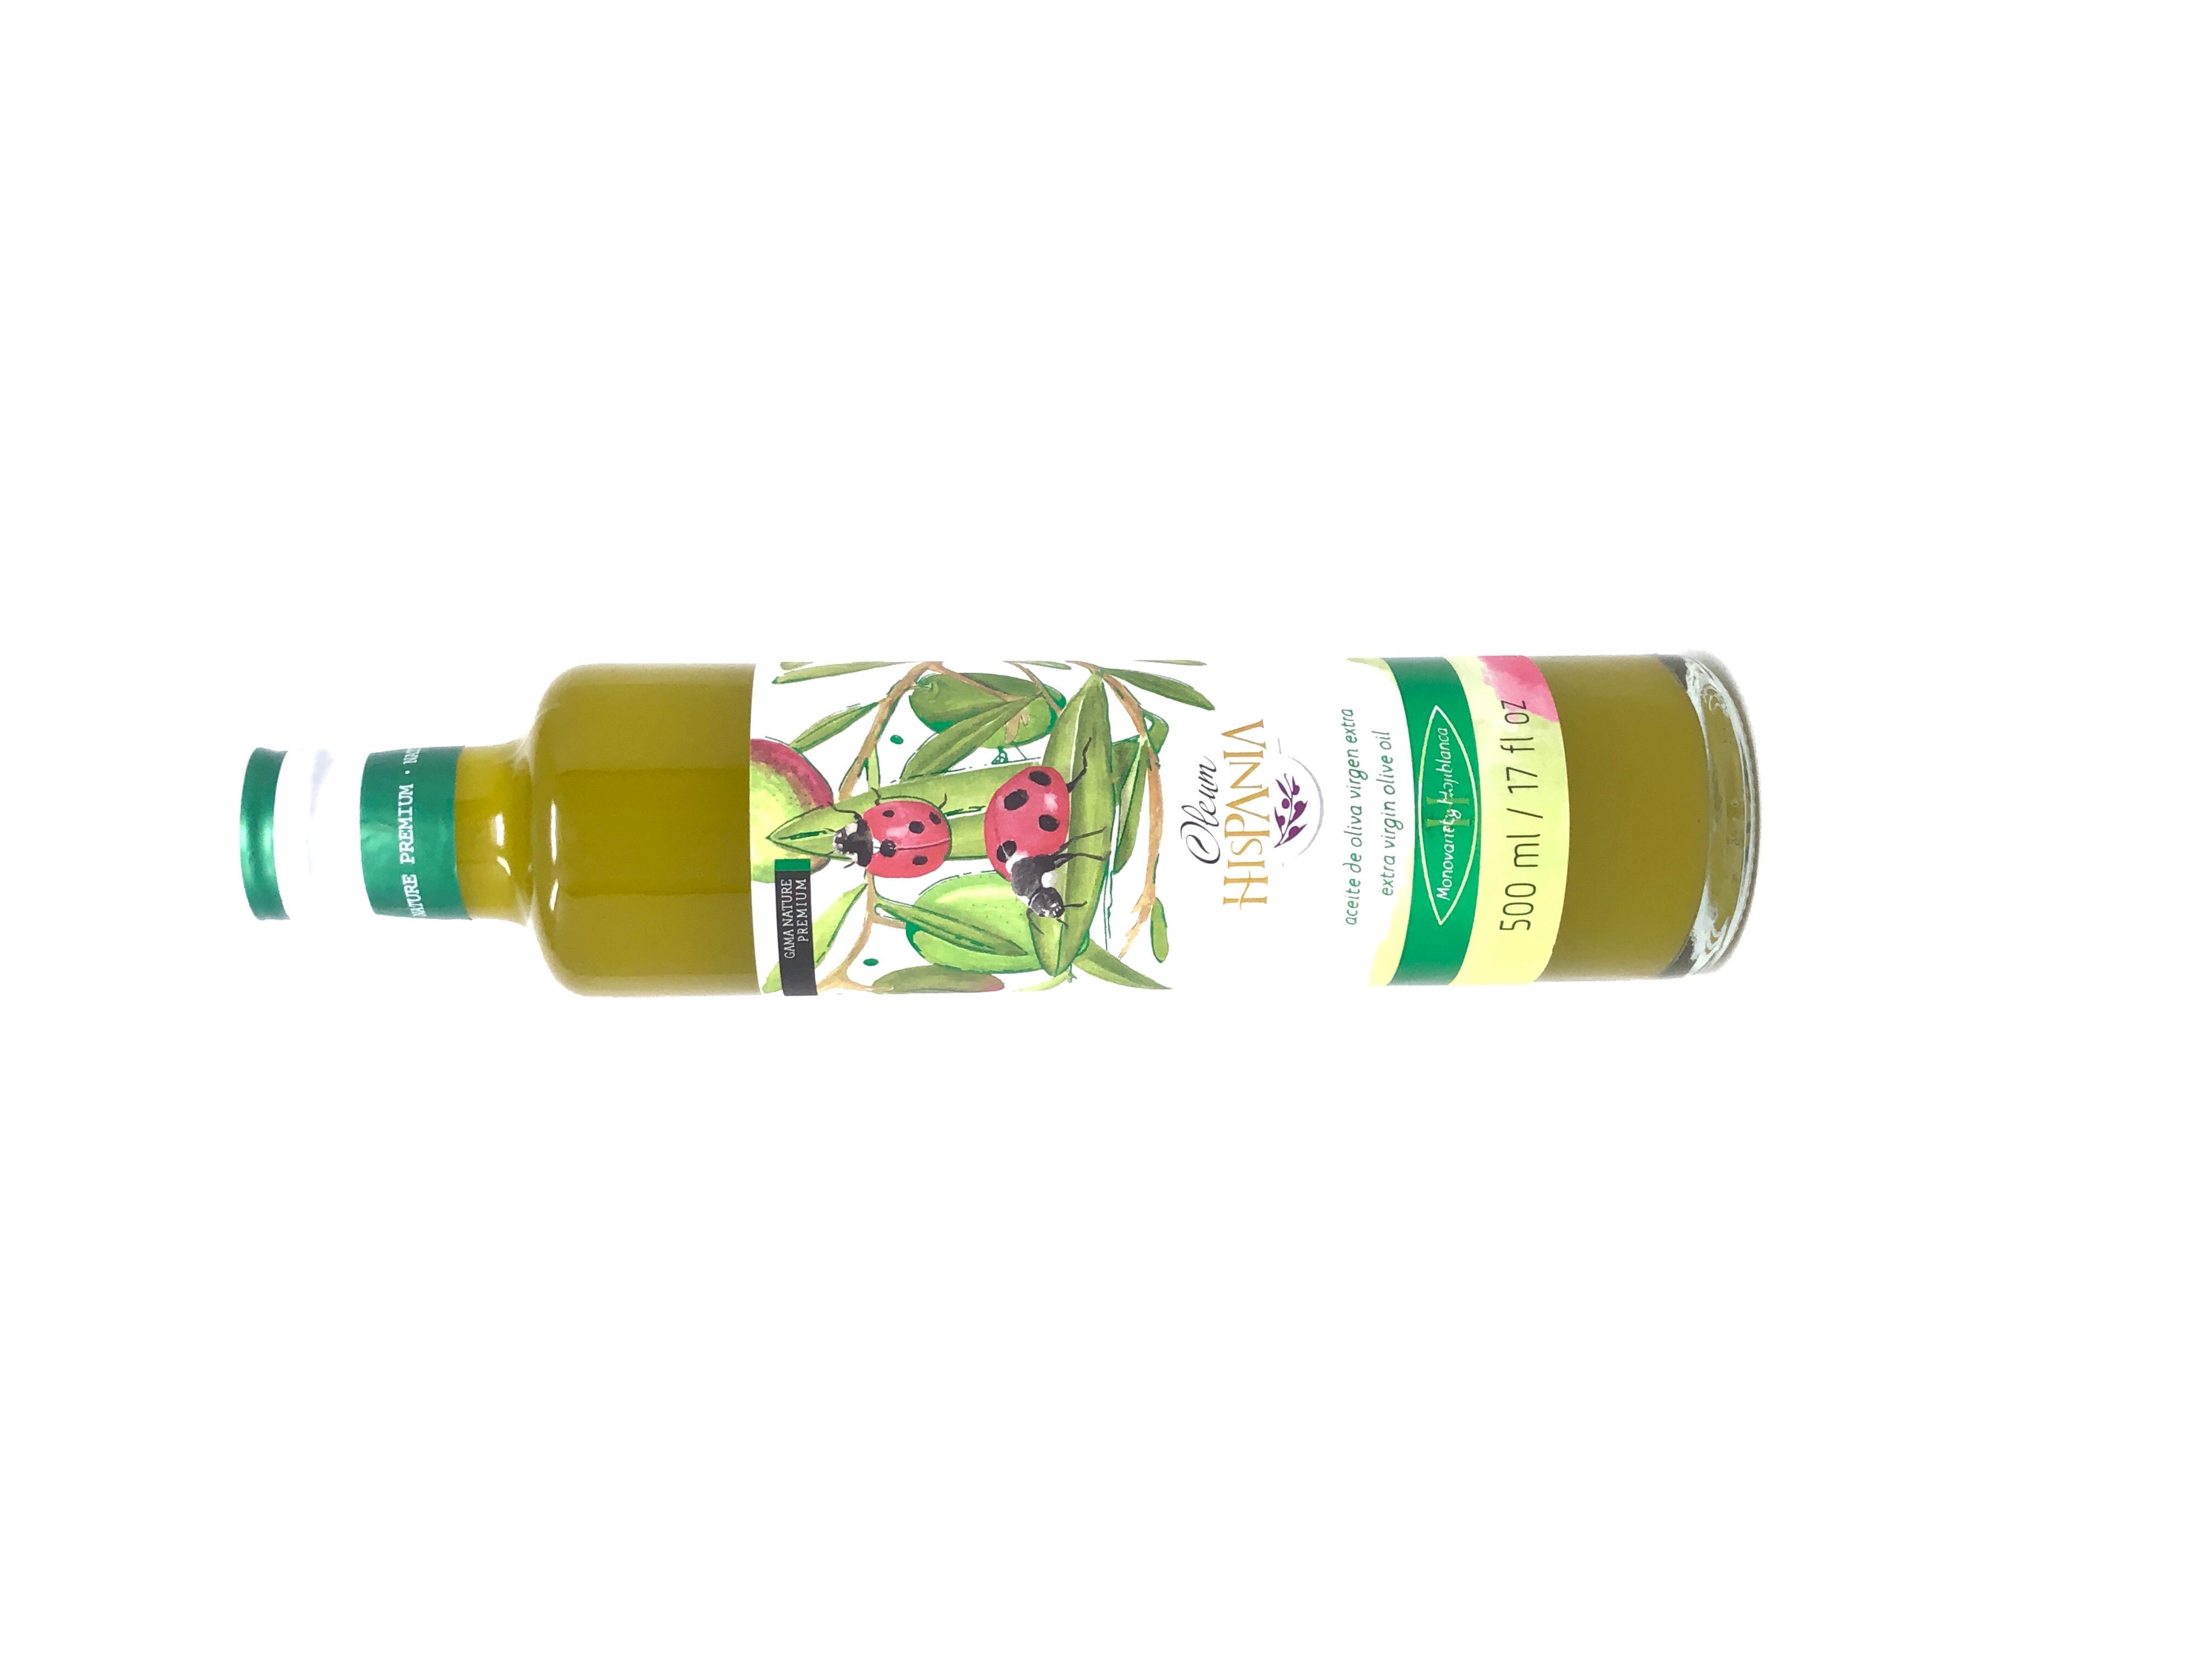 aceite de oliva de priego de cordoba hispania nature premium de cosecha verde procedente de olivos hojiblanca